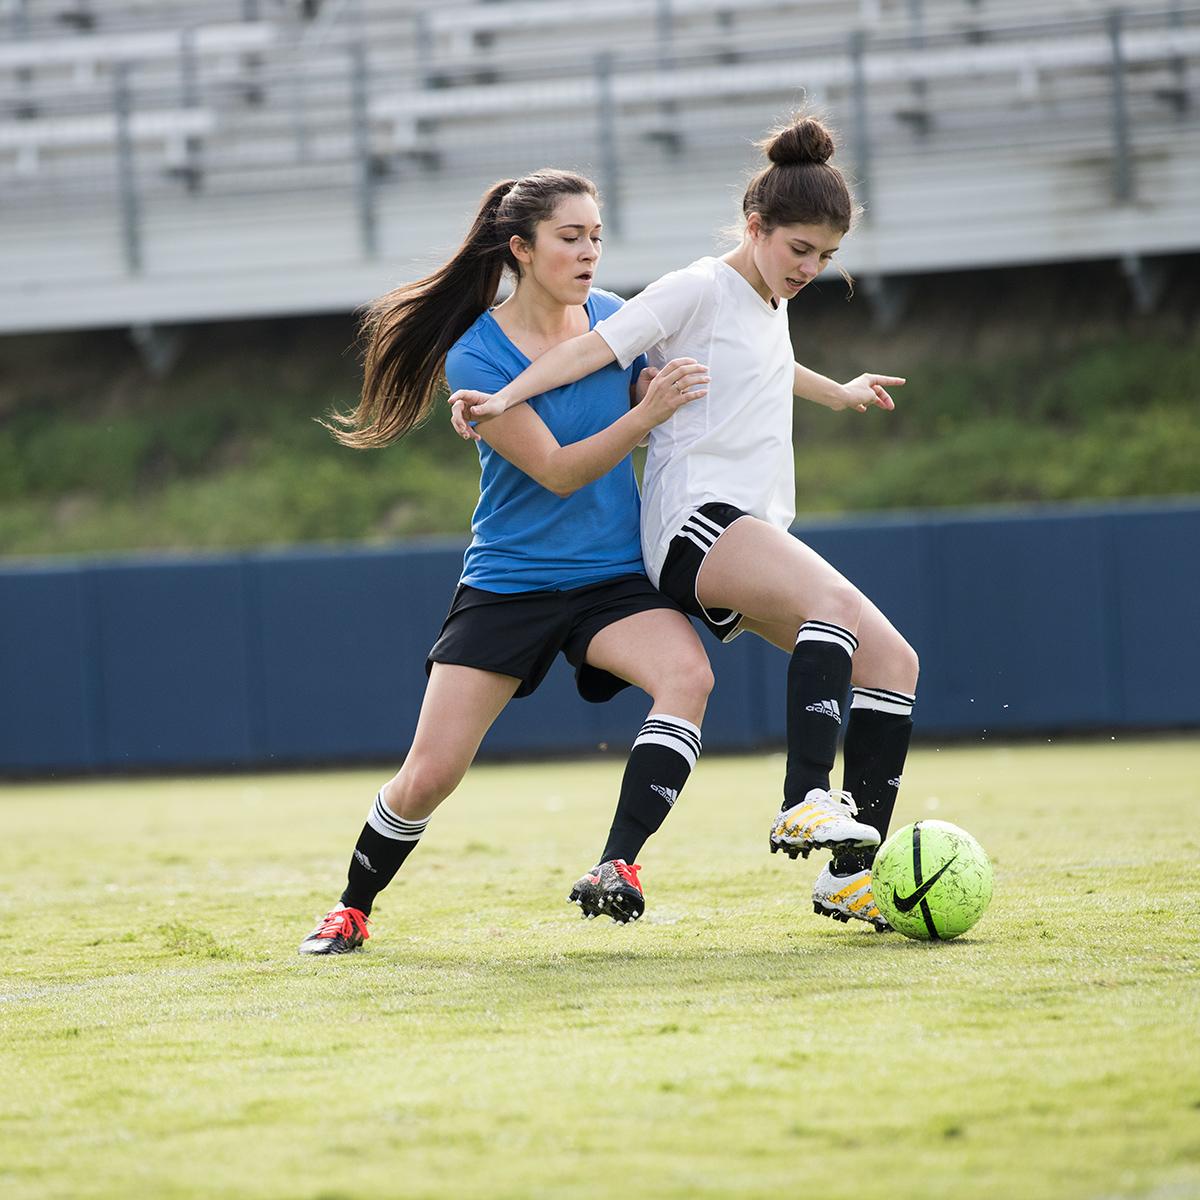 SC17_IG_teamSports_soccerW_1200x1200.jpg